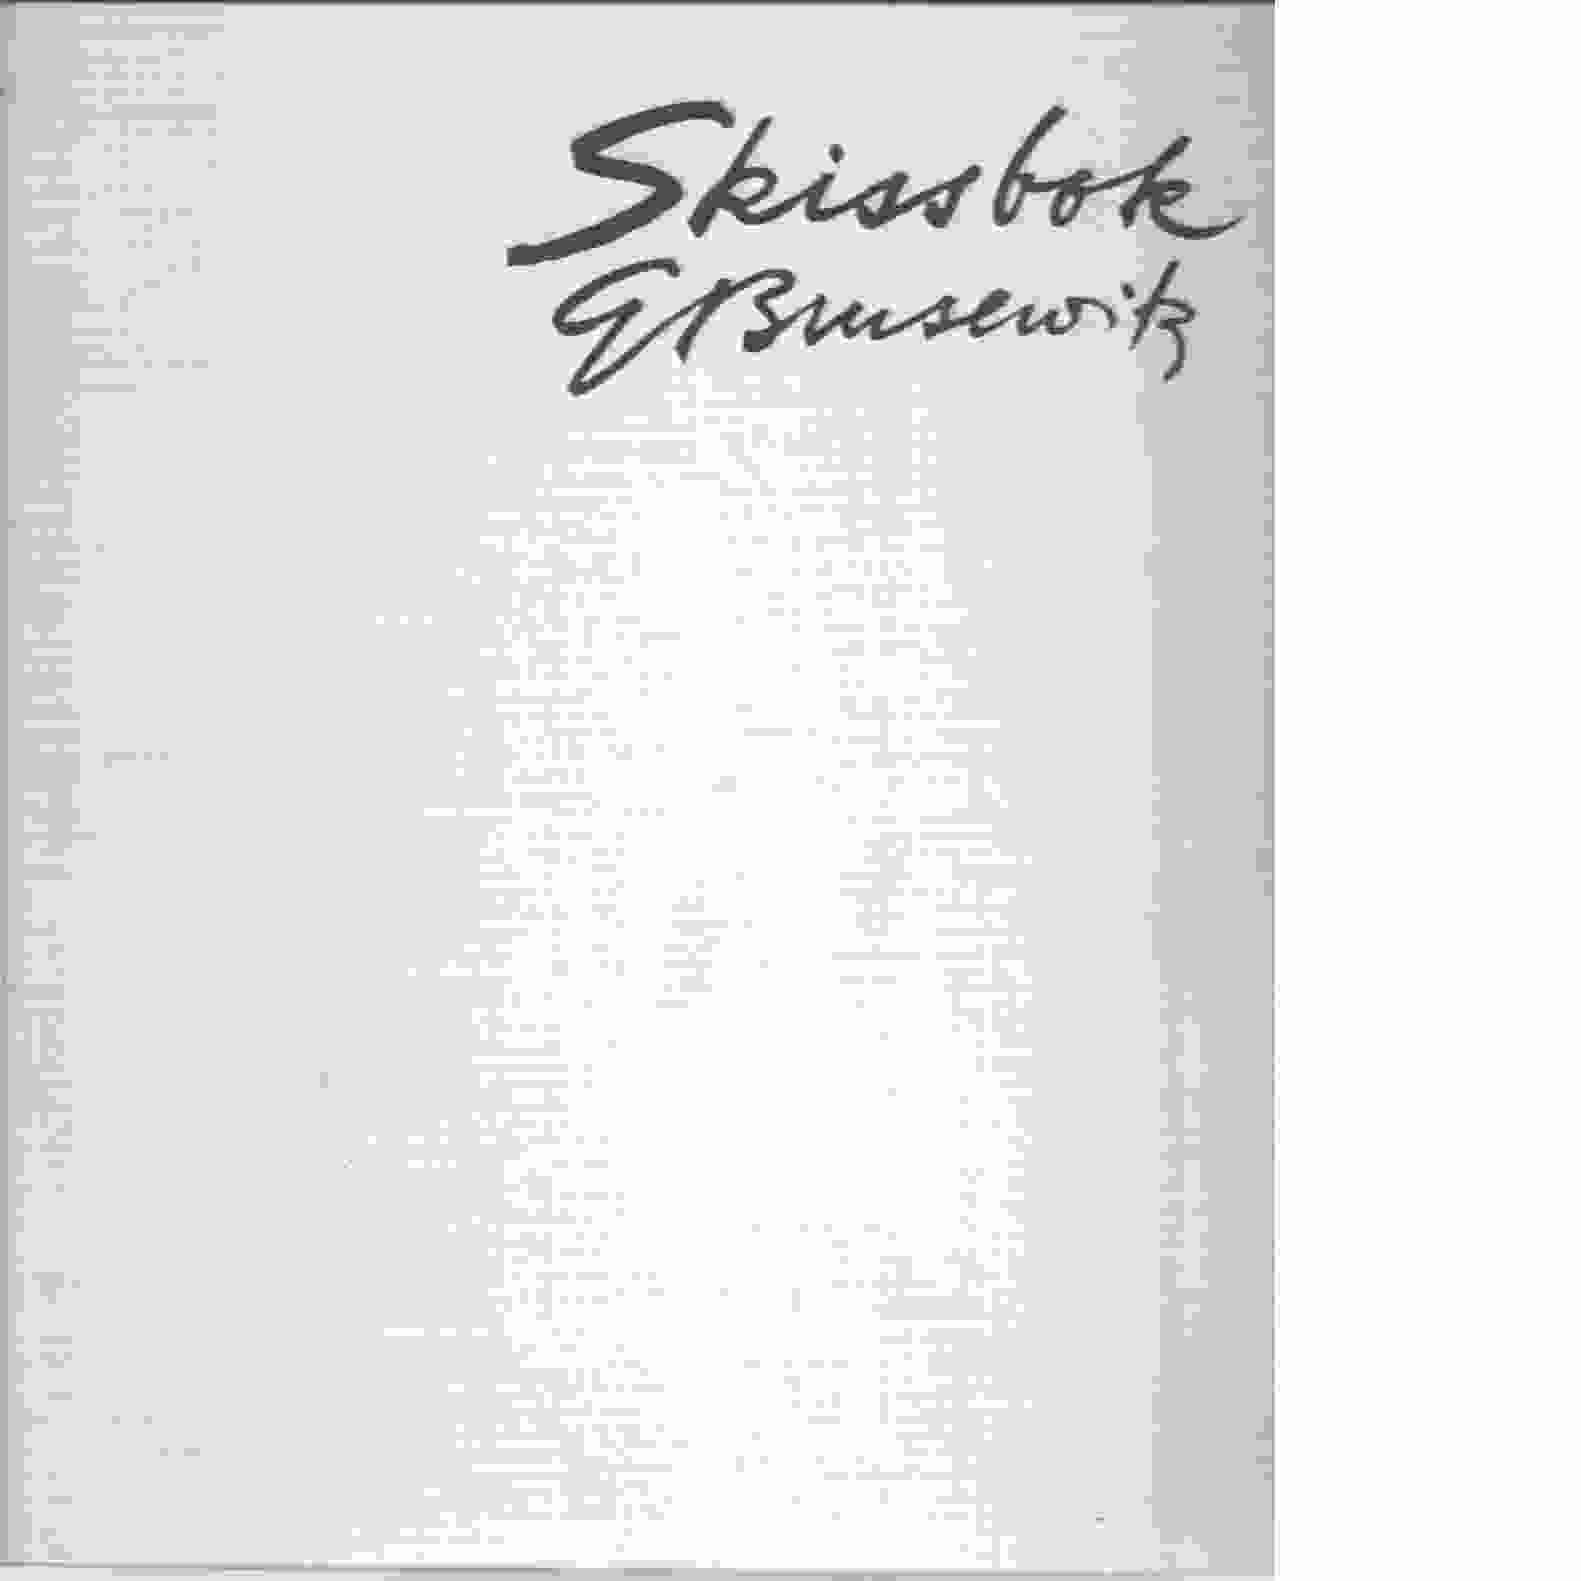 Skissbok : anteckningar från svensk natur - Brusewitz, Gunnar